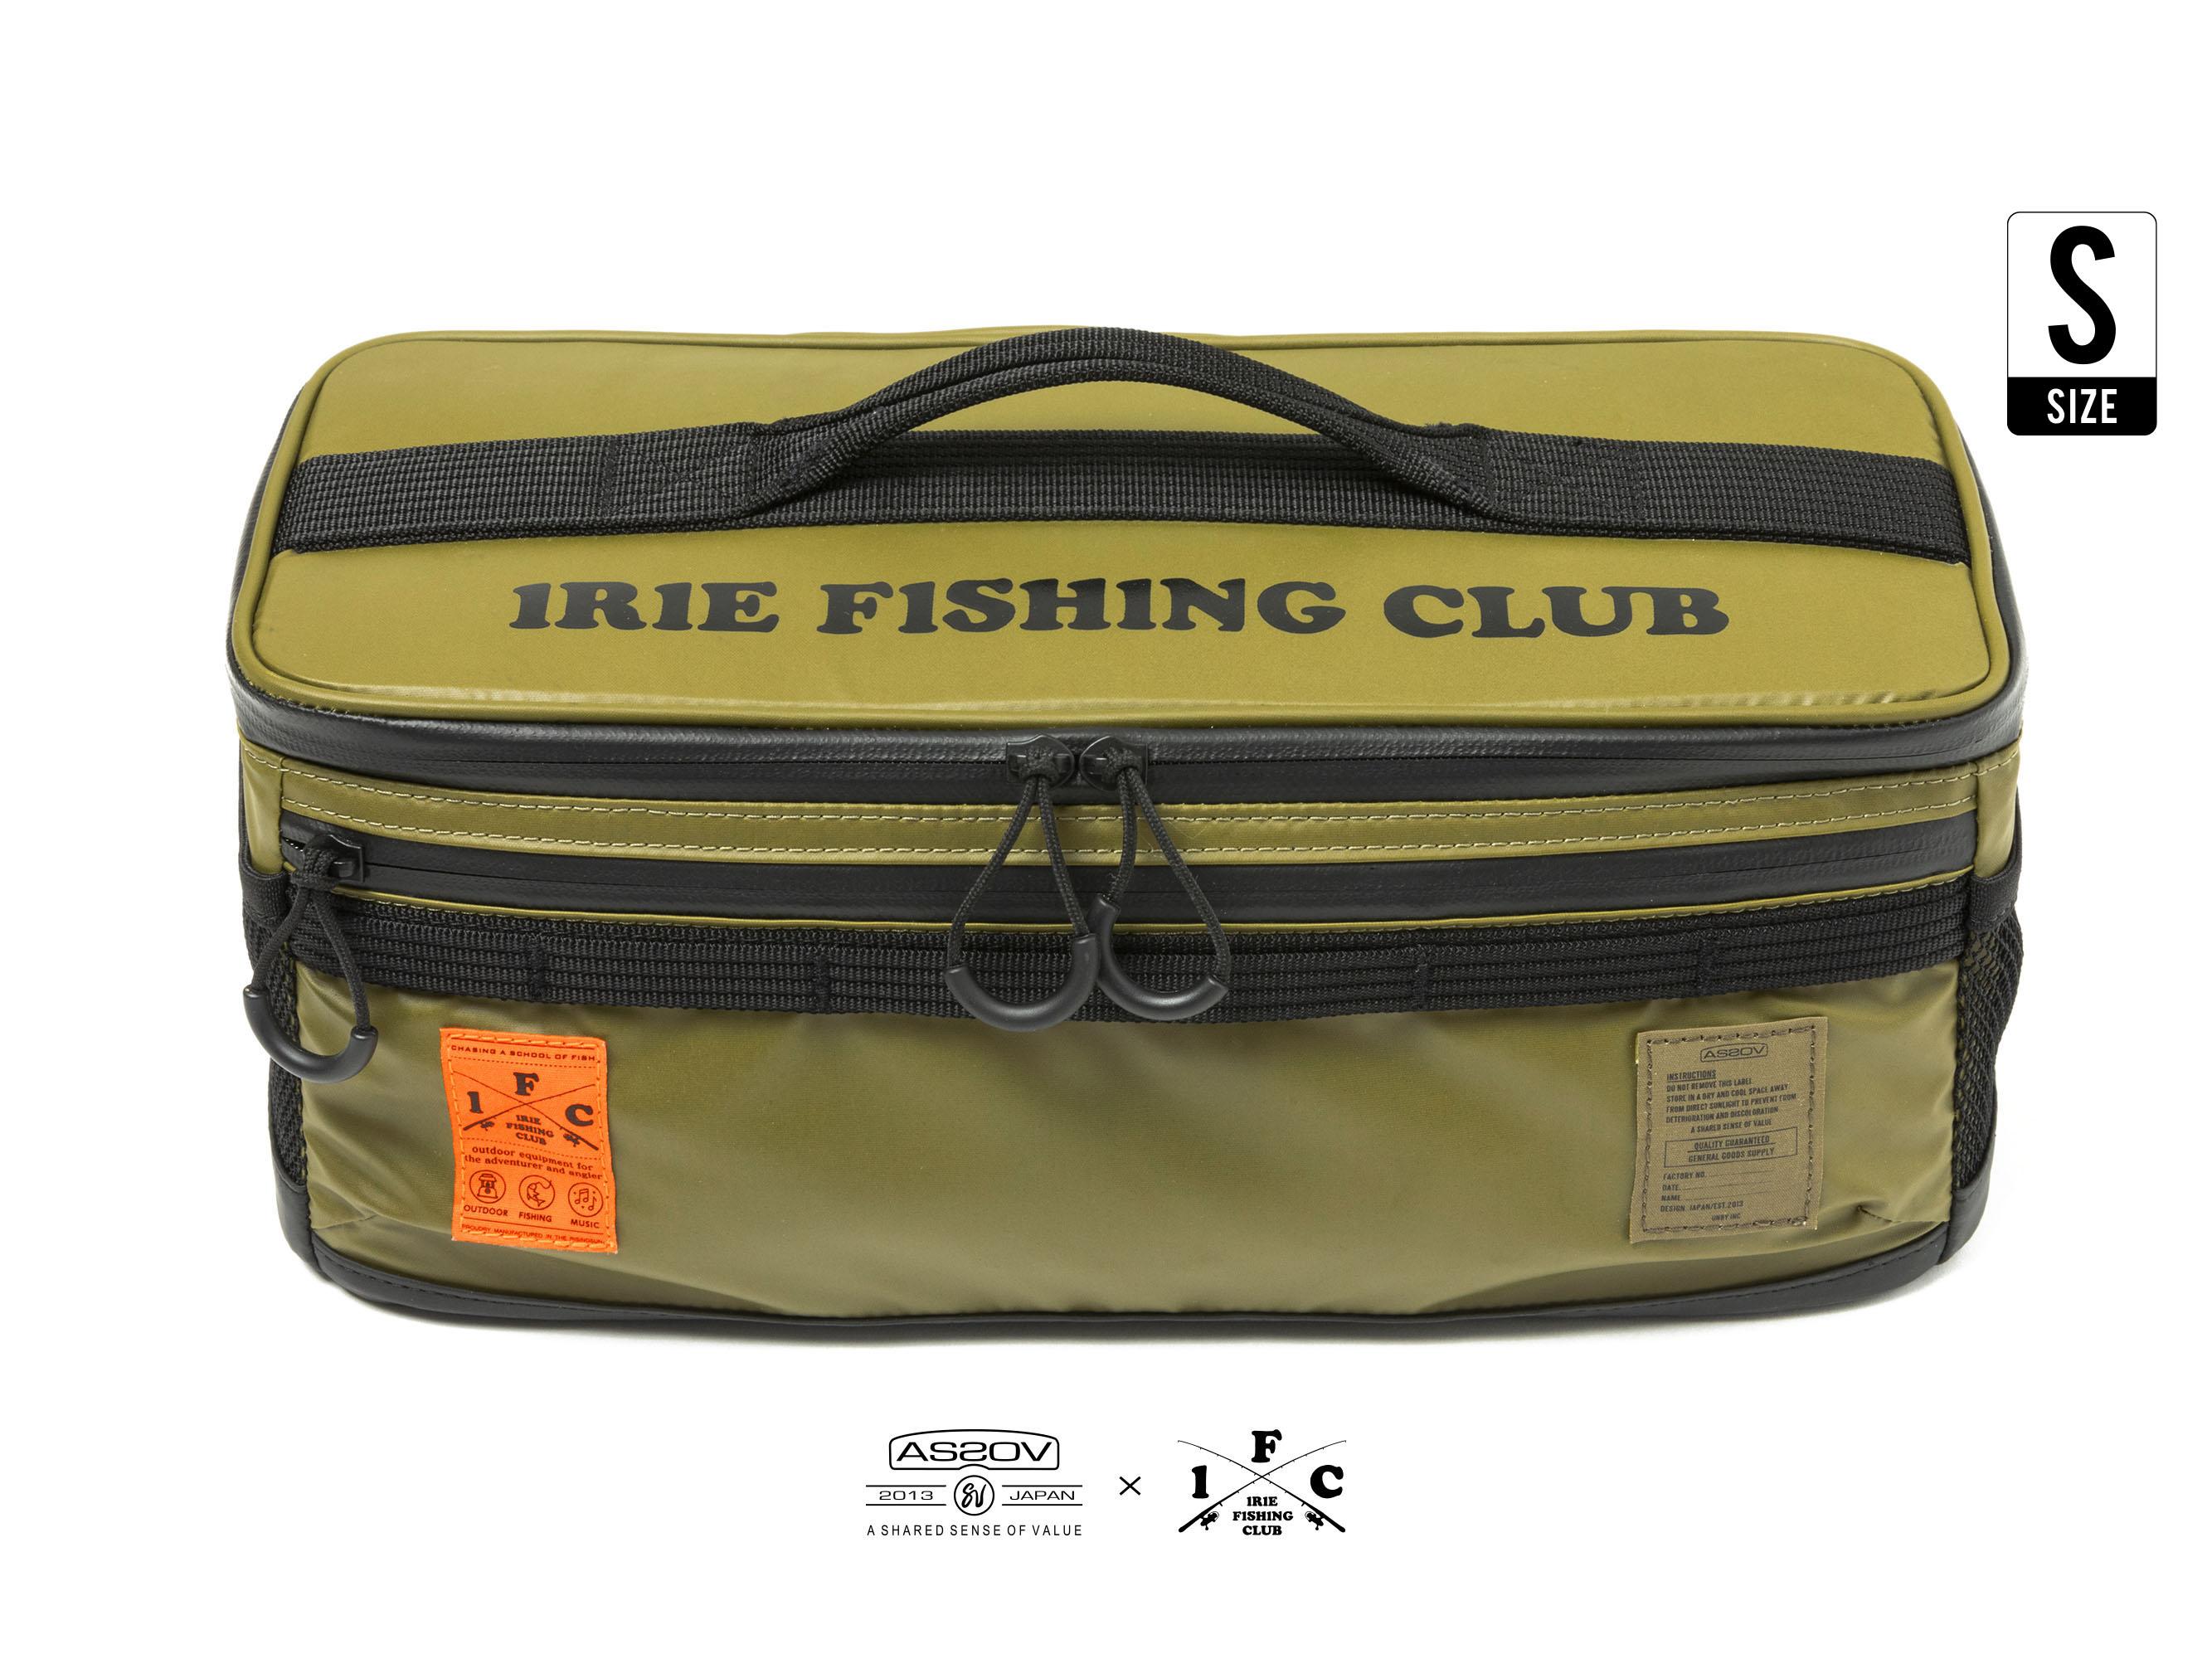 ×AS2OV NYLON POLYCARBONATE CONTAINER BOX(S) - IRIE FISHING CLUB